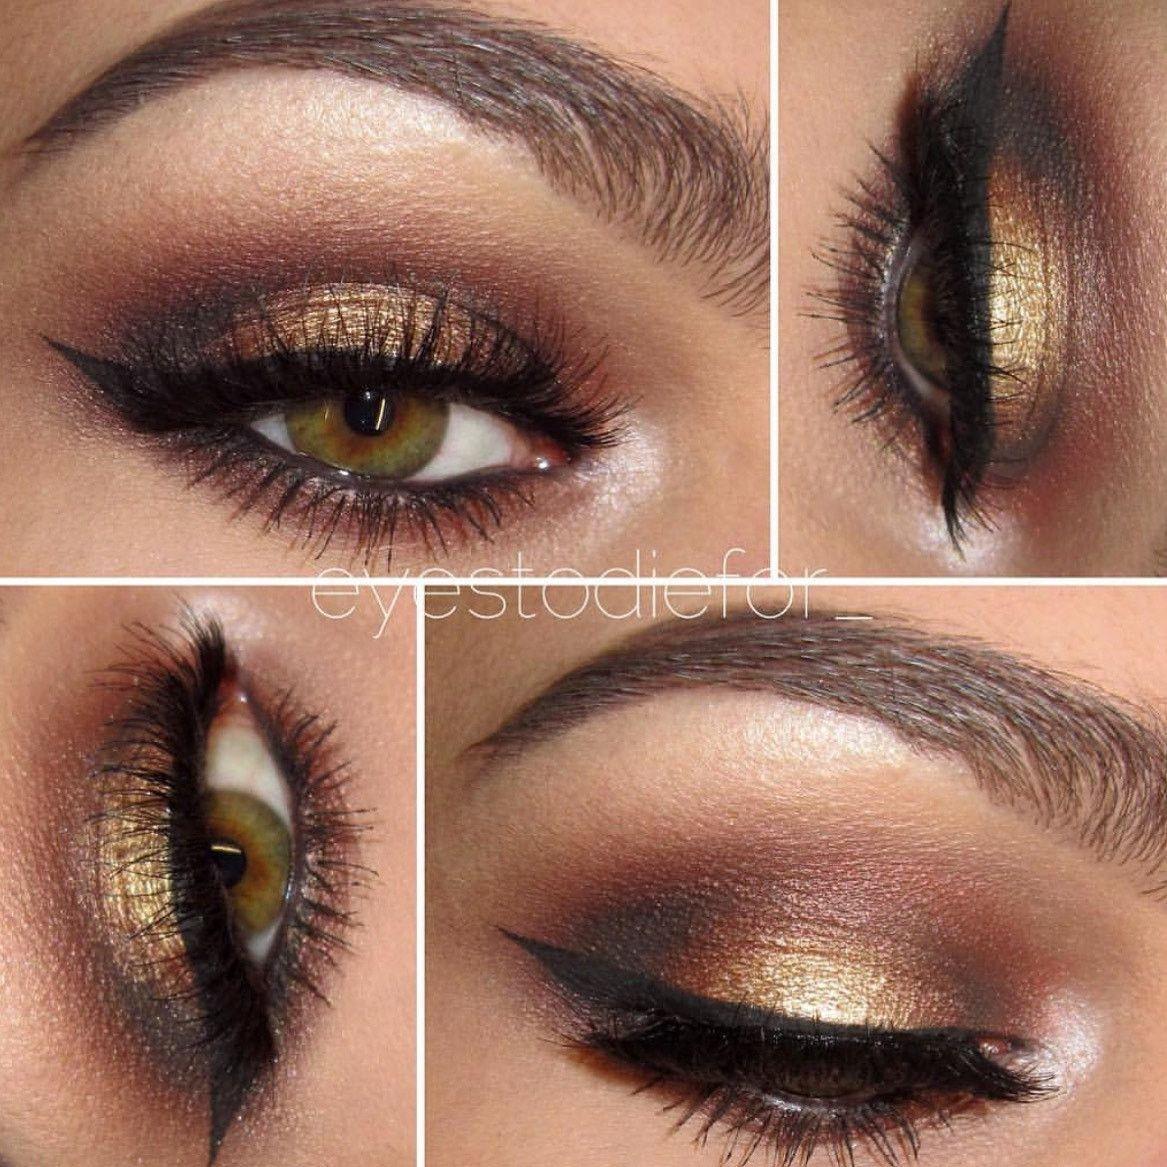 seduction- get this look! all natural, vegan eyeshadow and eyeliner